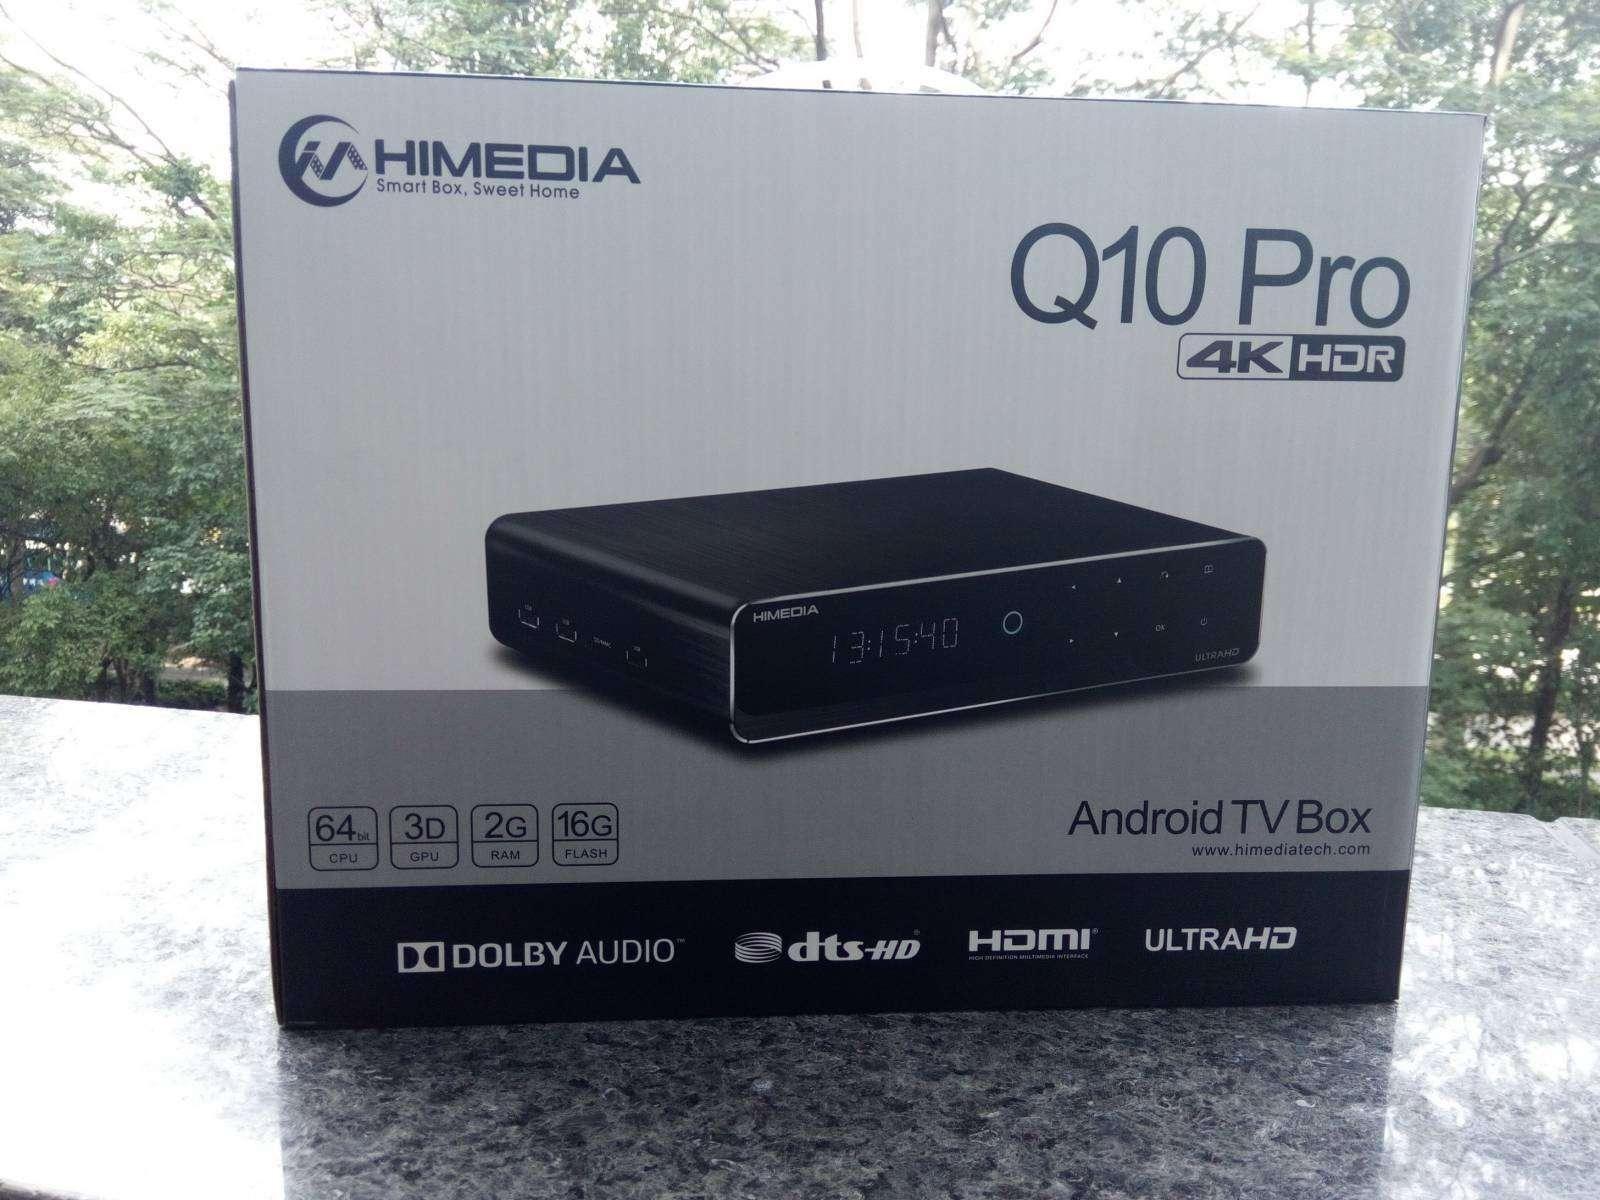 Ebay: Большой обзор HiMedia Q10 Pro - Android TV Box, оснащенной Hisilicon Hi3798C V200